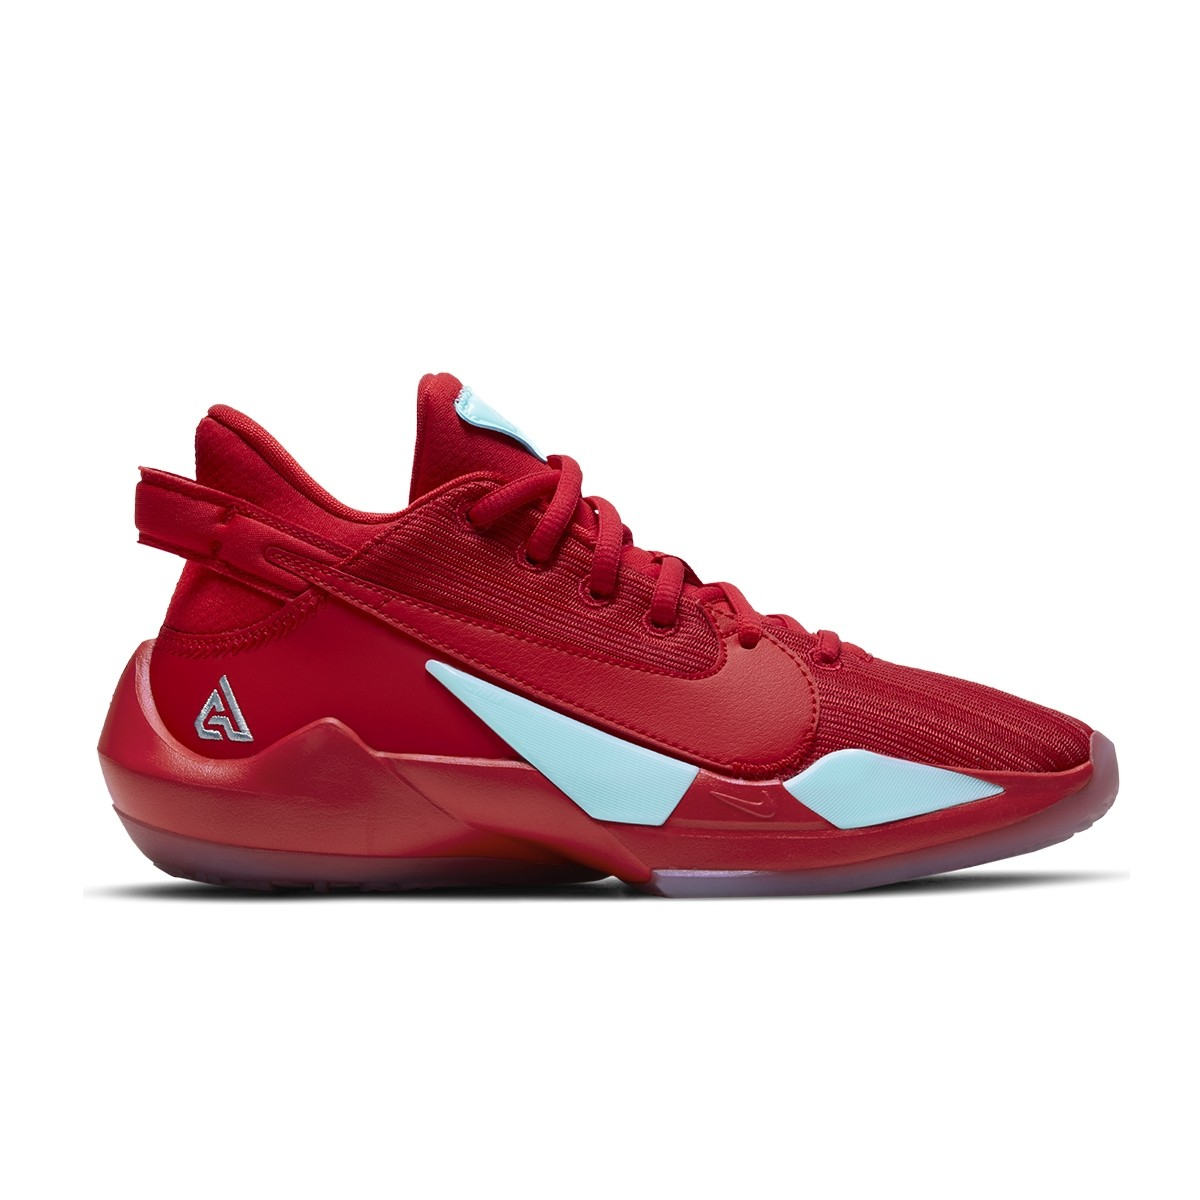 Nike Zoom Freak 2 GS 'Red Glacier Ice'